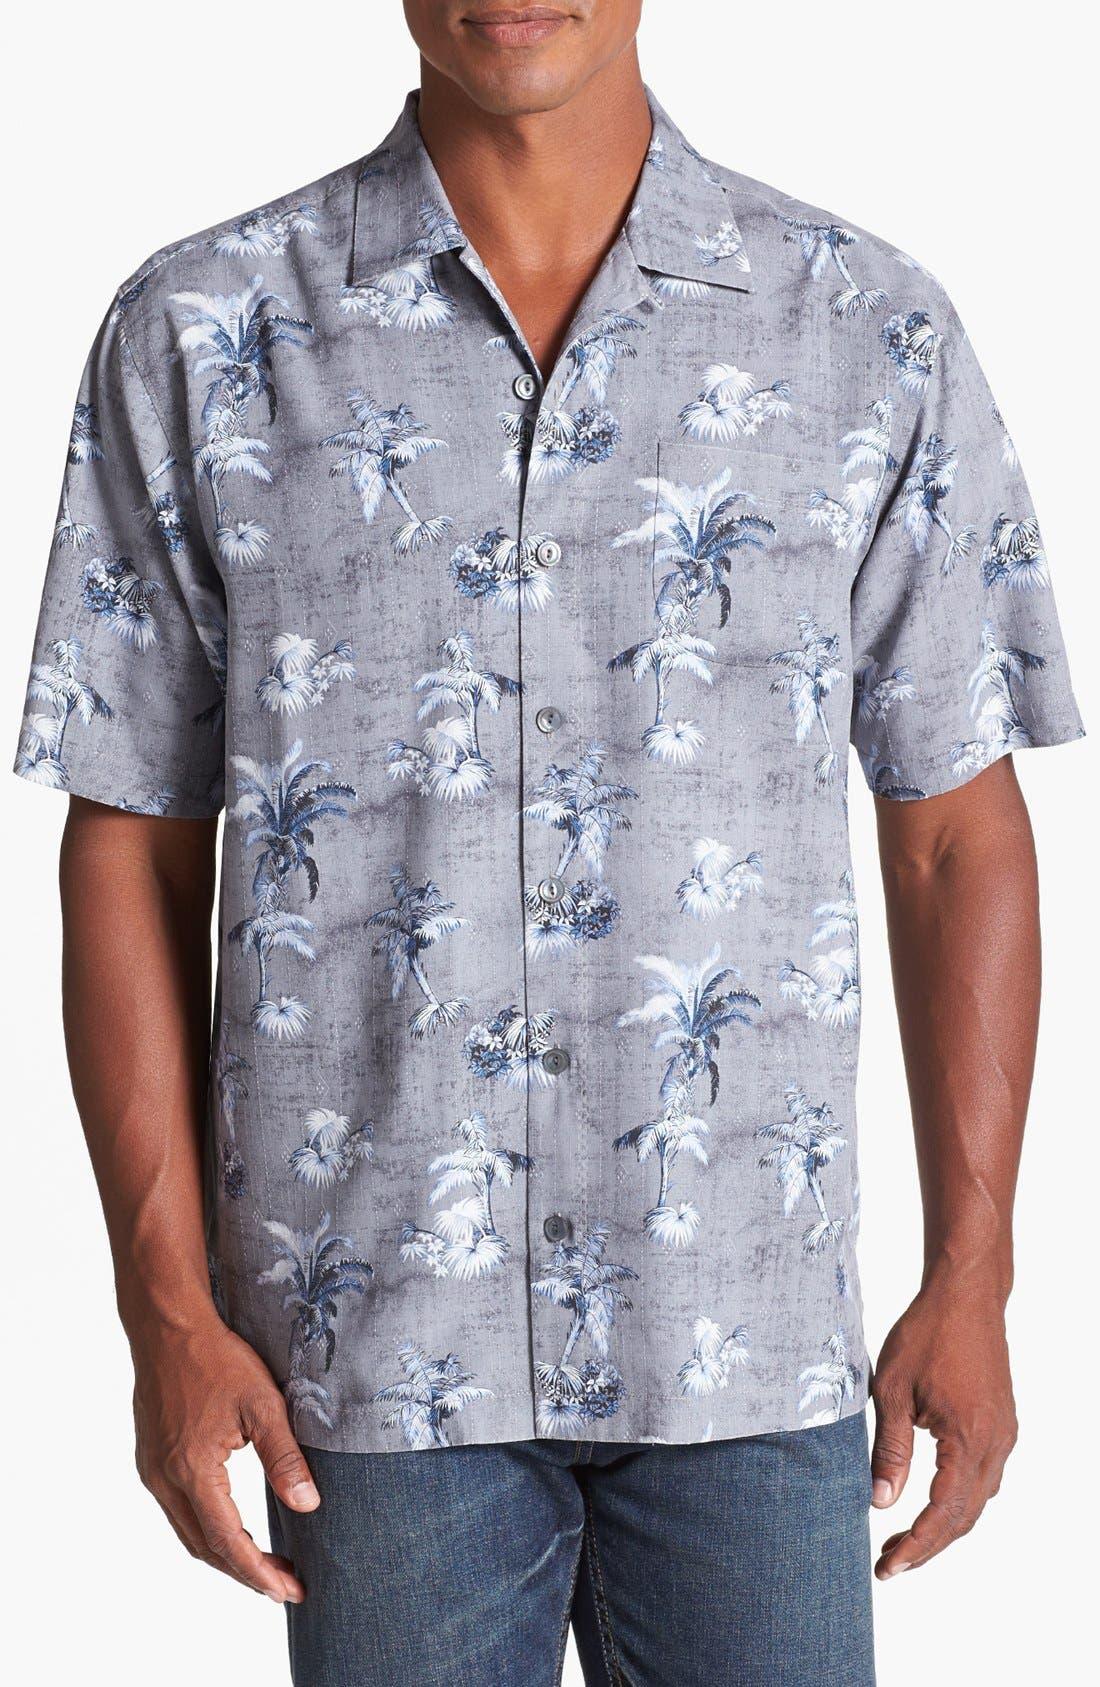 Alternate Image 1 Selected - Tommy Bahama 'Arabian Oasis' Campshirt